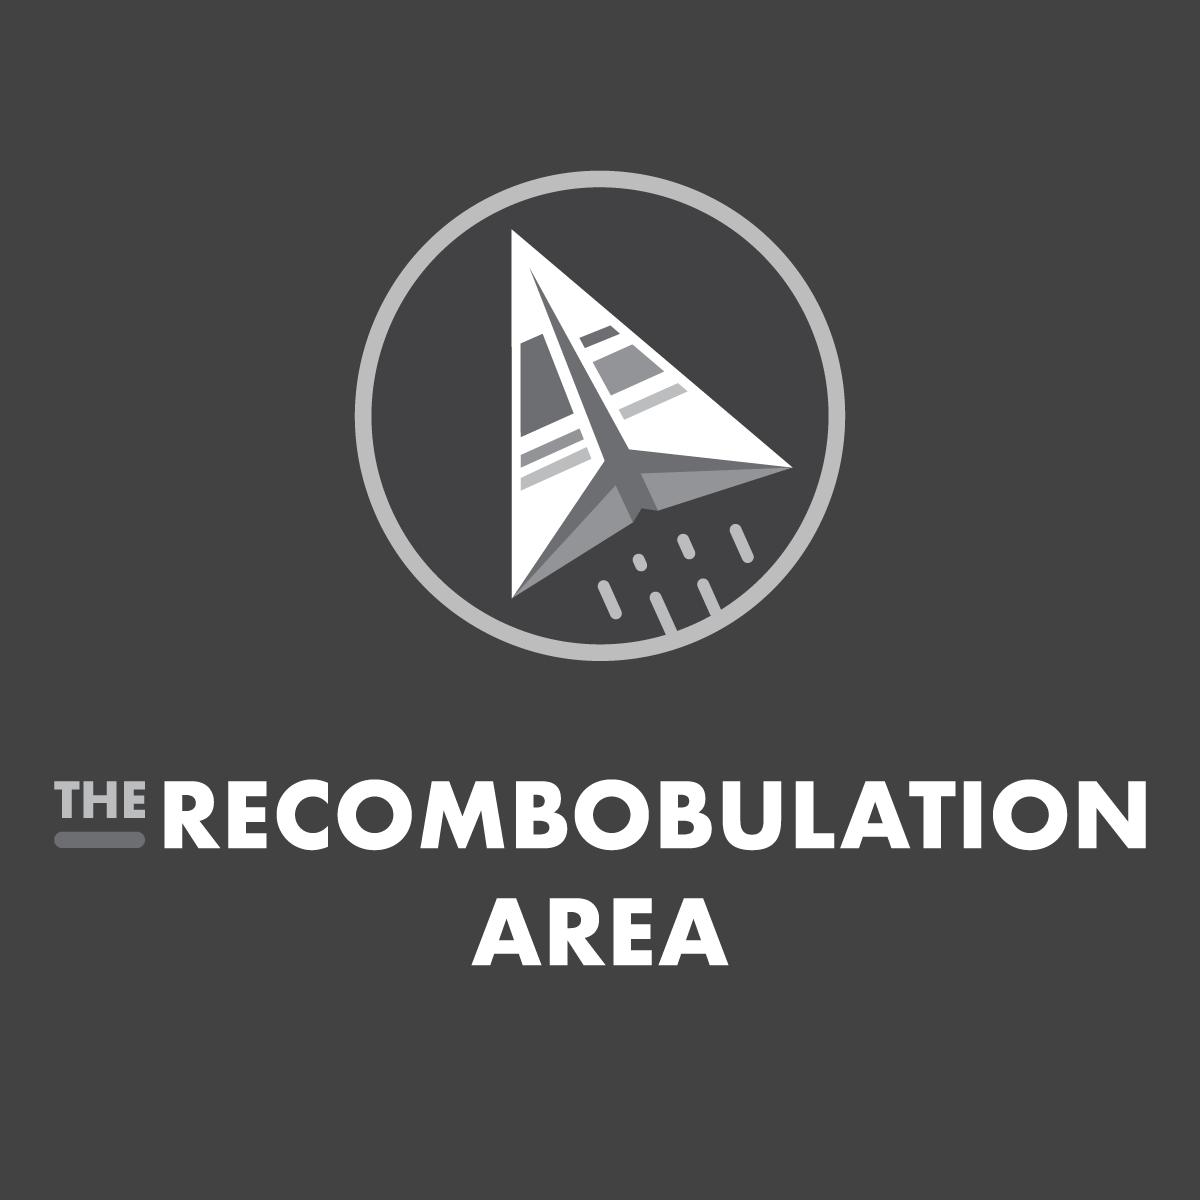 The Recombobulation Area